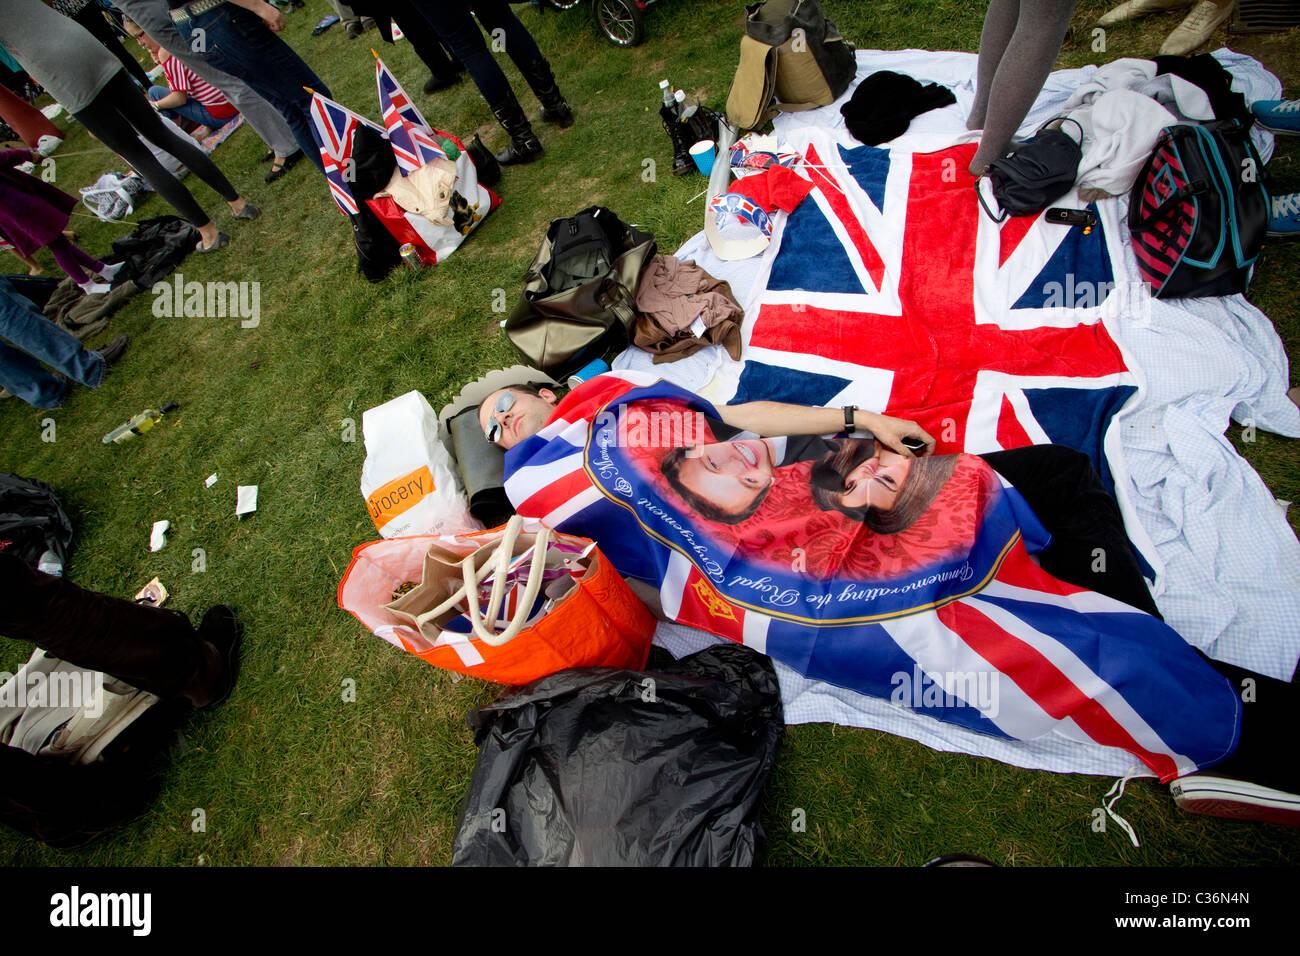 royal wedding reveller asleep under flag of Catherine Middleton and Prince William hyde park - Stock Image